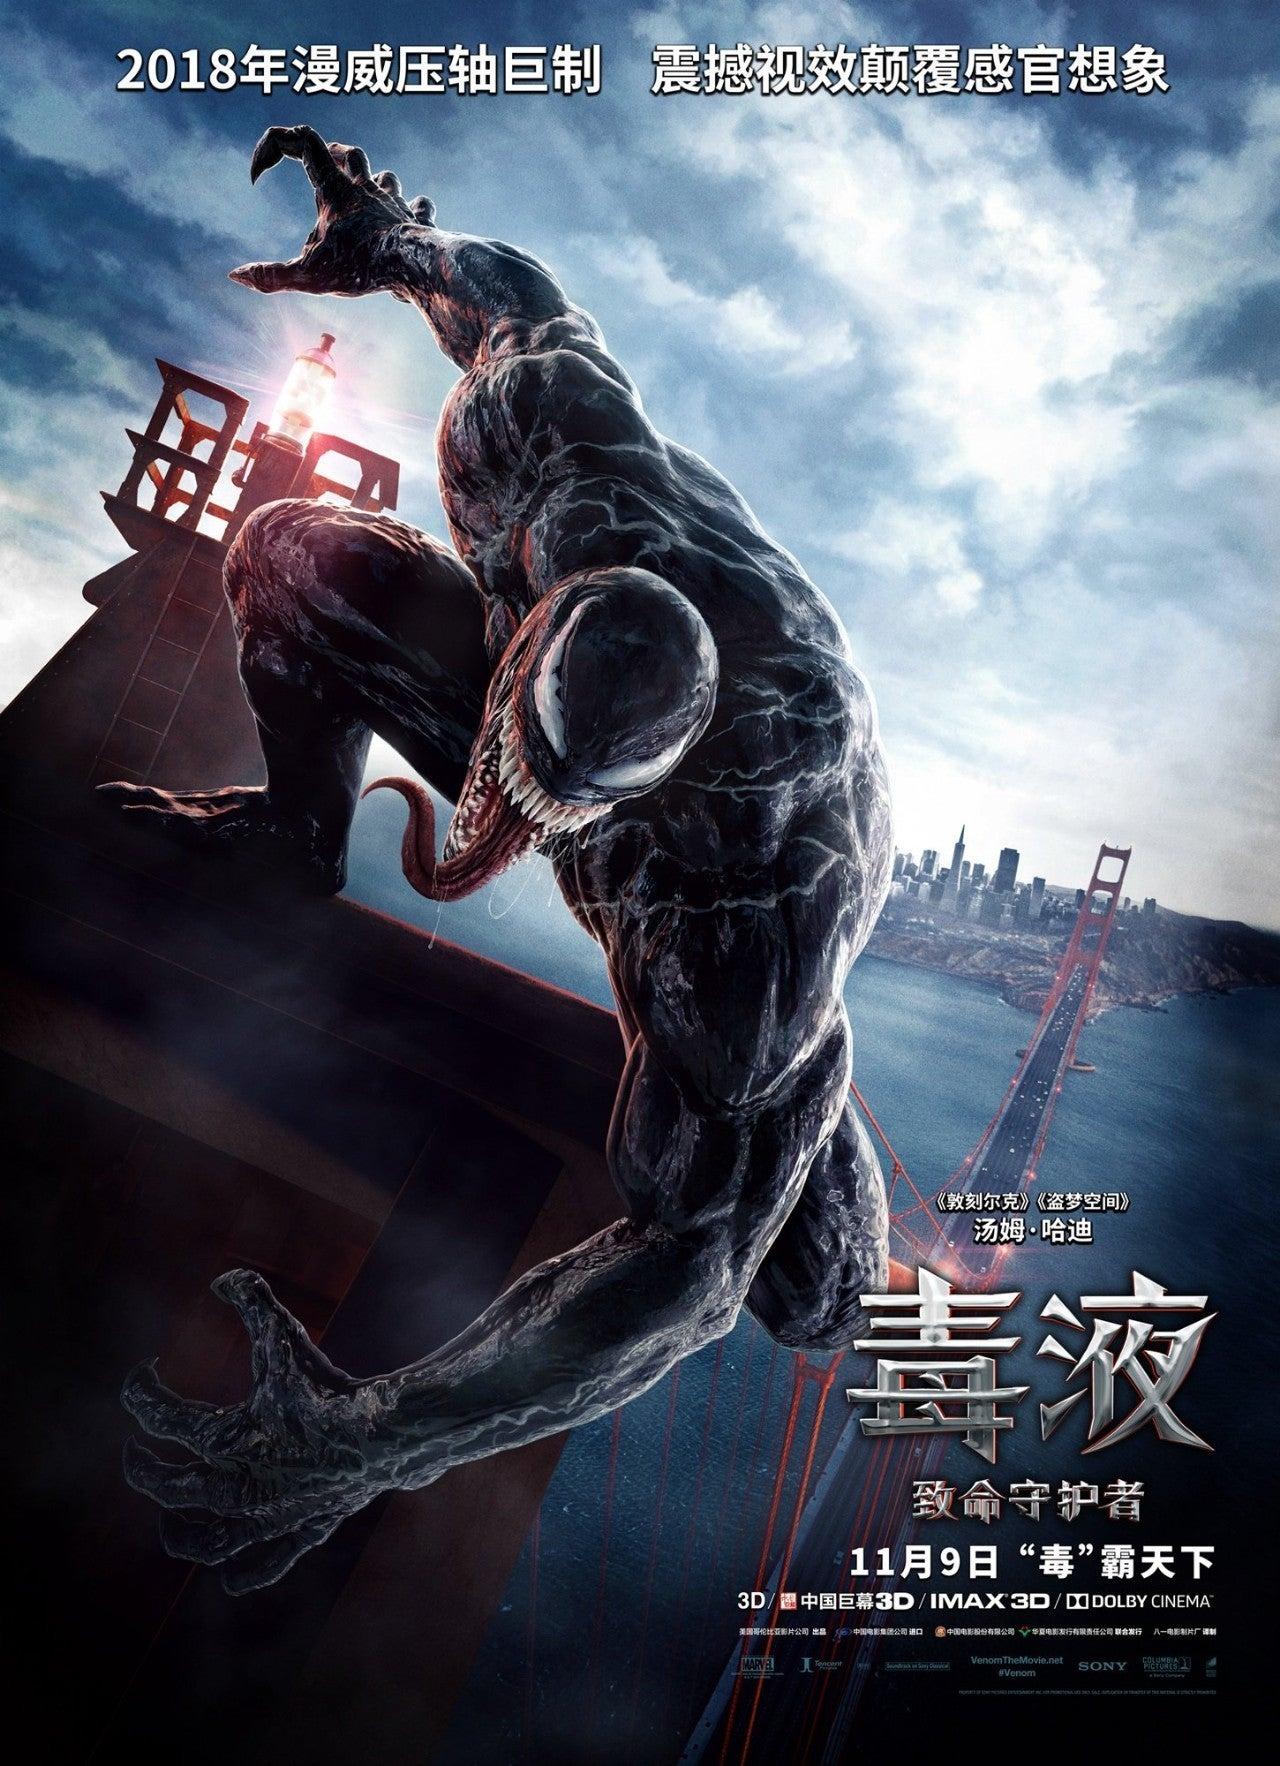 New 'venom' International Trailer Reveals Shevenom